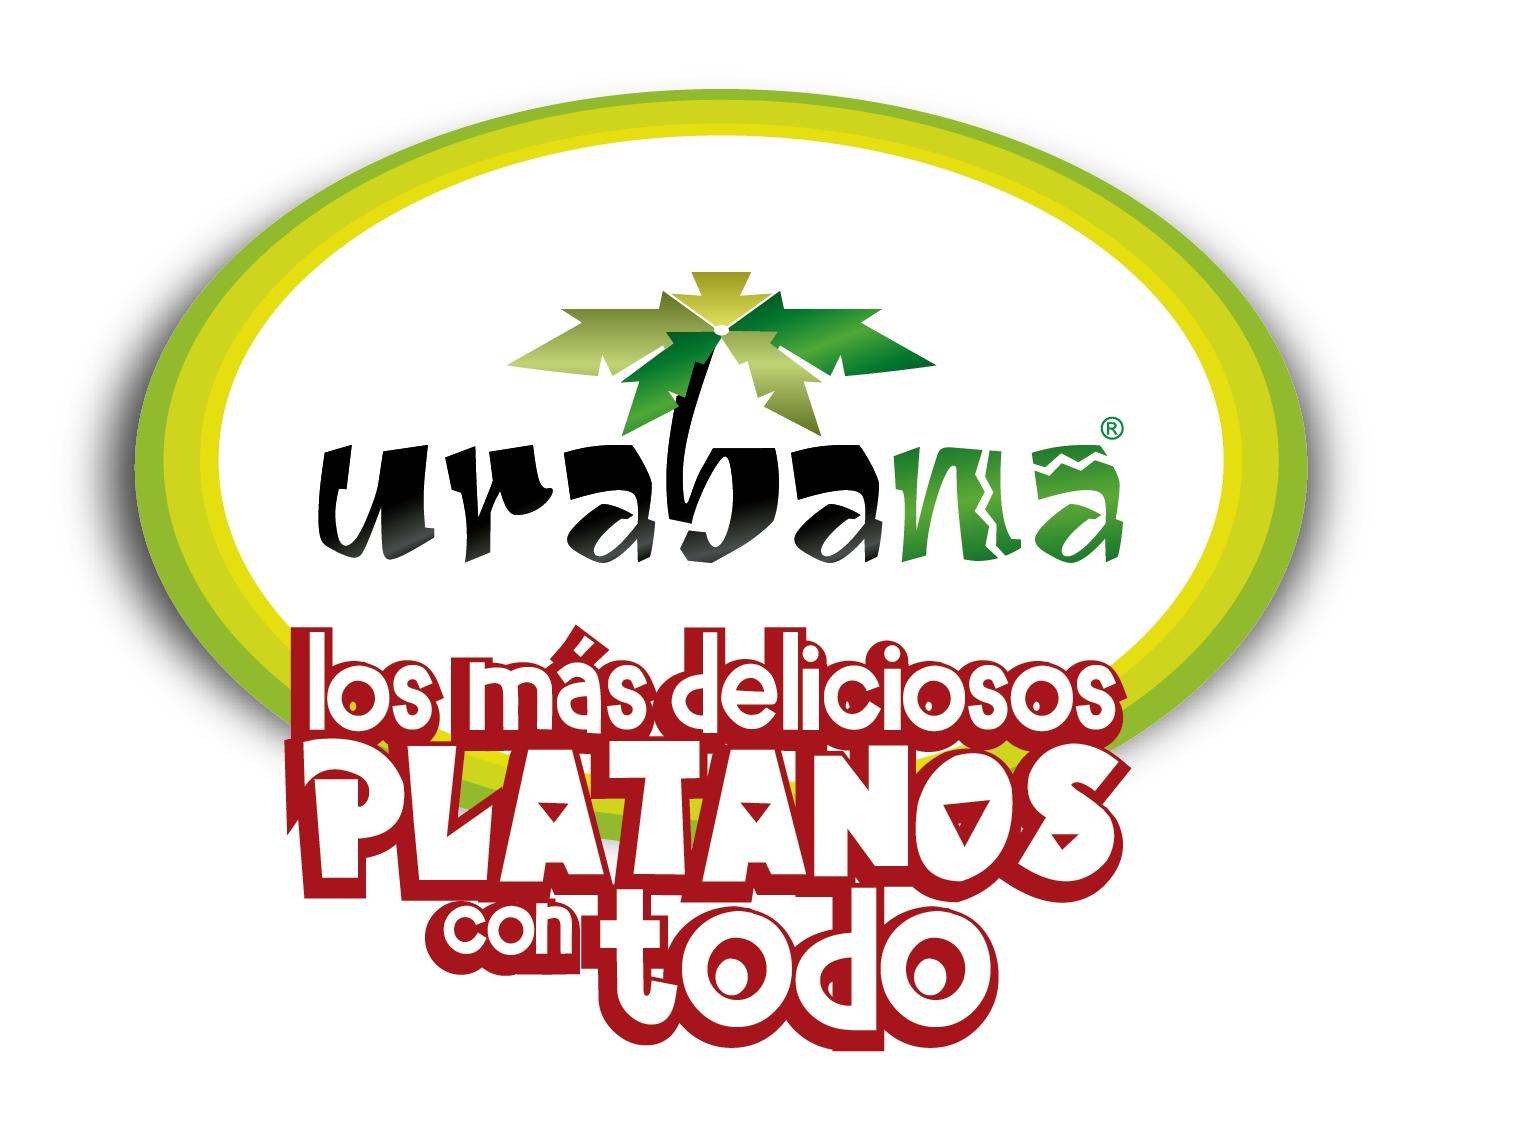 Urabana Premium Plaza